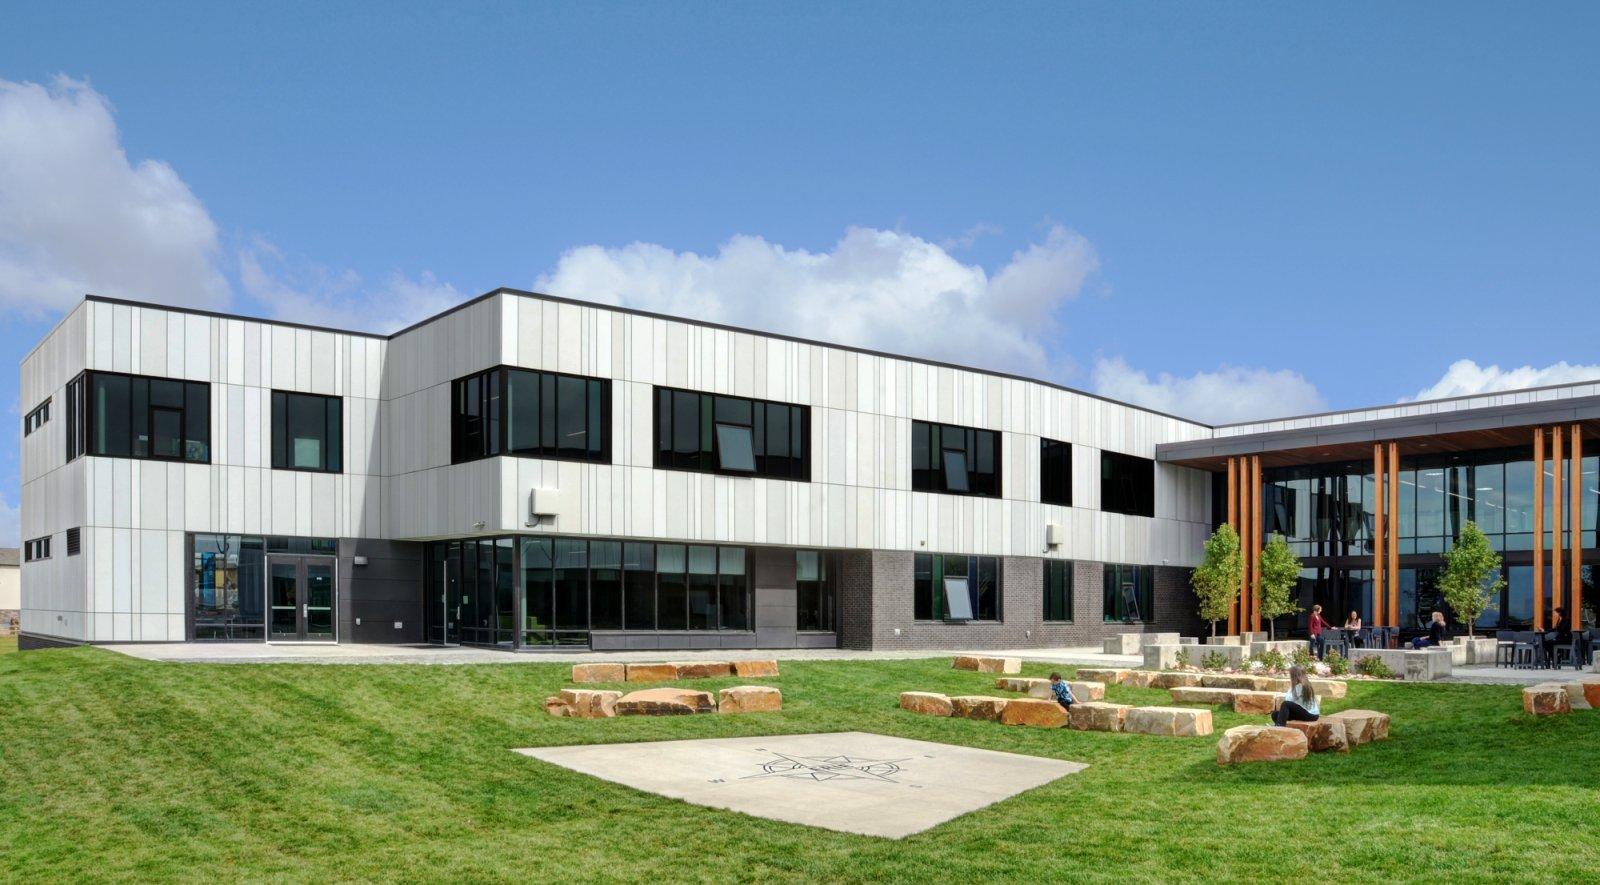 Meadowlark School